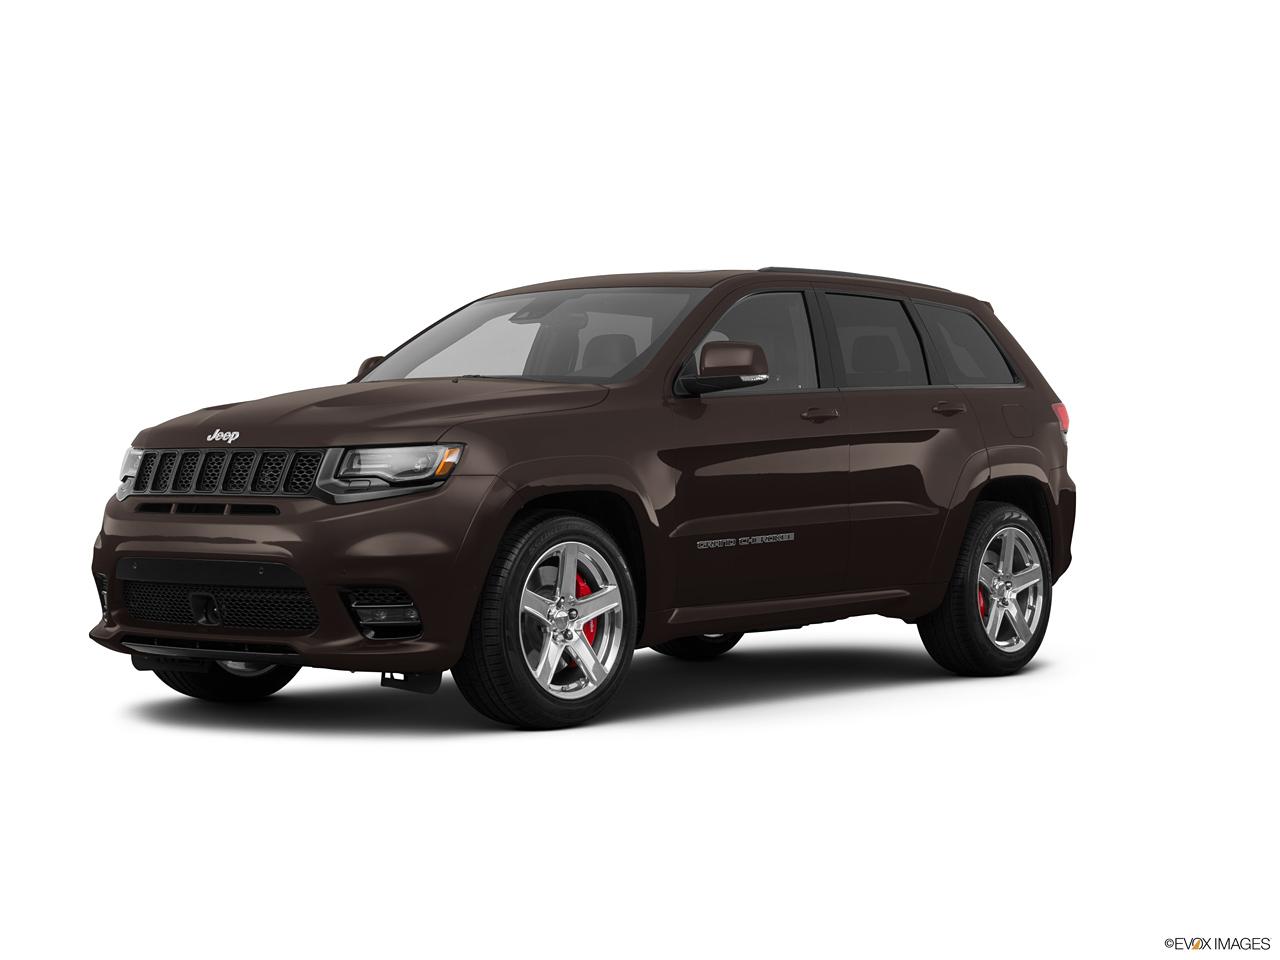 car pictures list for jeep grand cherokee 2017 srt8 qatar yallamotor. Black Bedroom Furniture Sets. Home Design Ideas